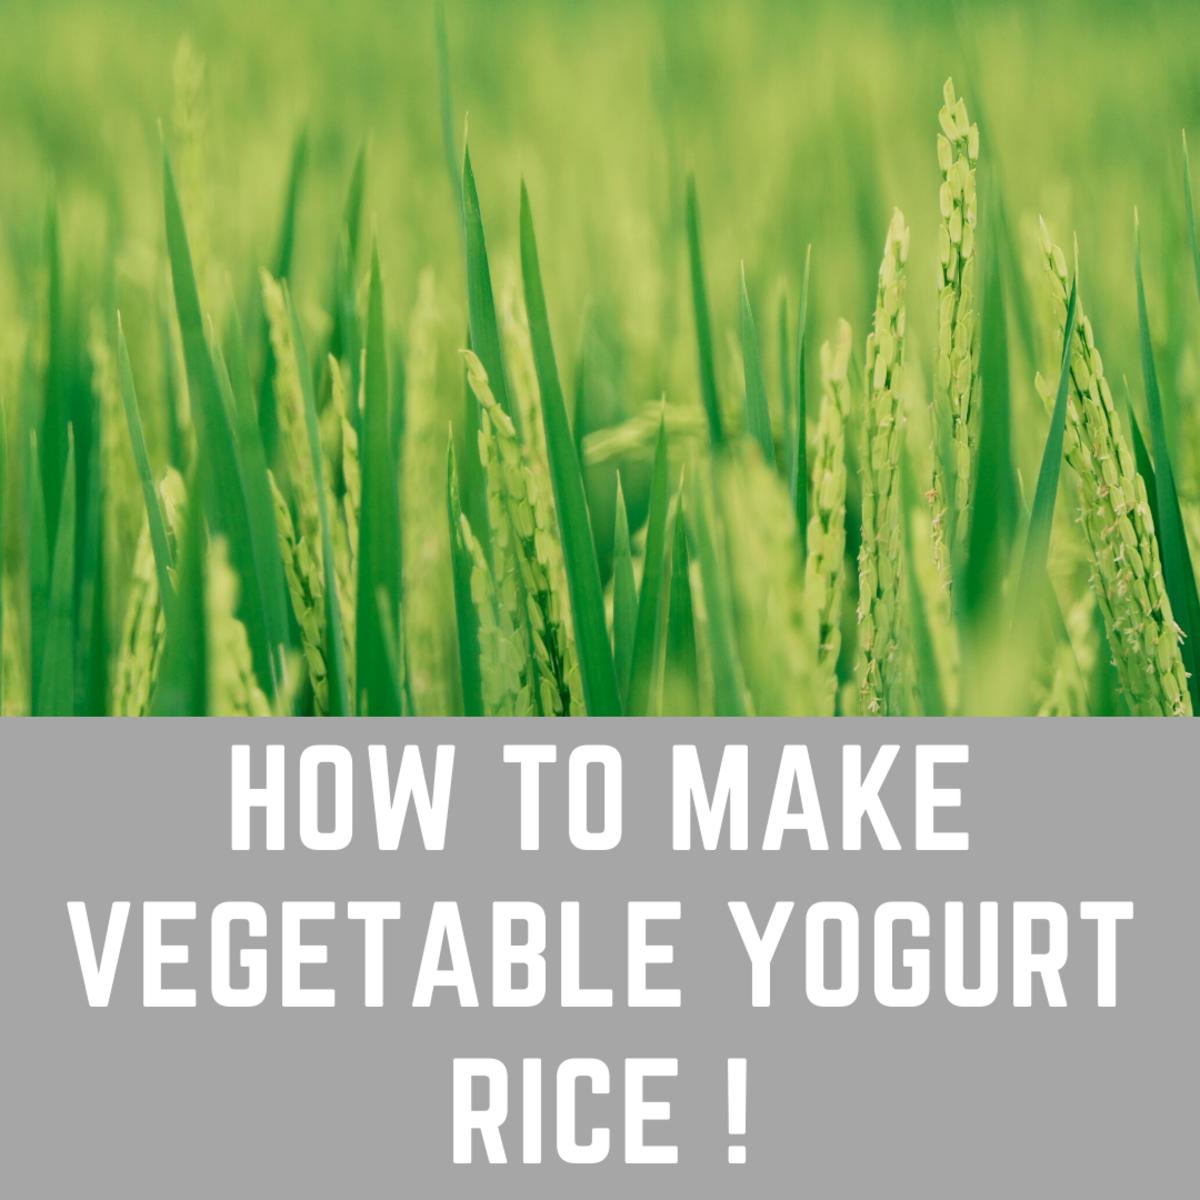 How to Make Vegetable Yogurt Rice (Vegetable Tahari)